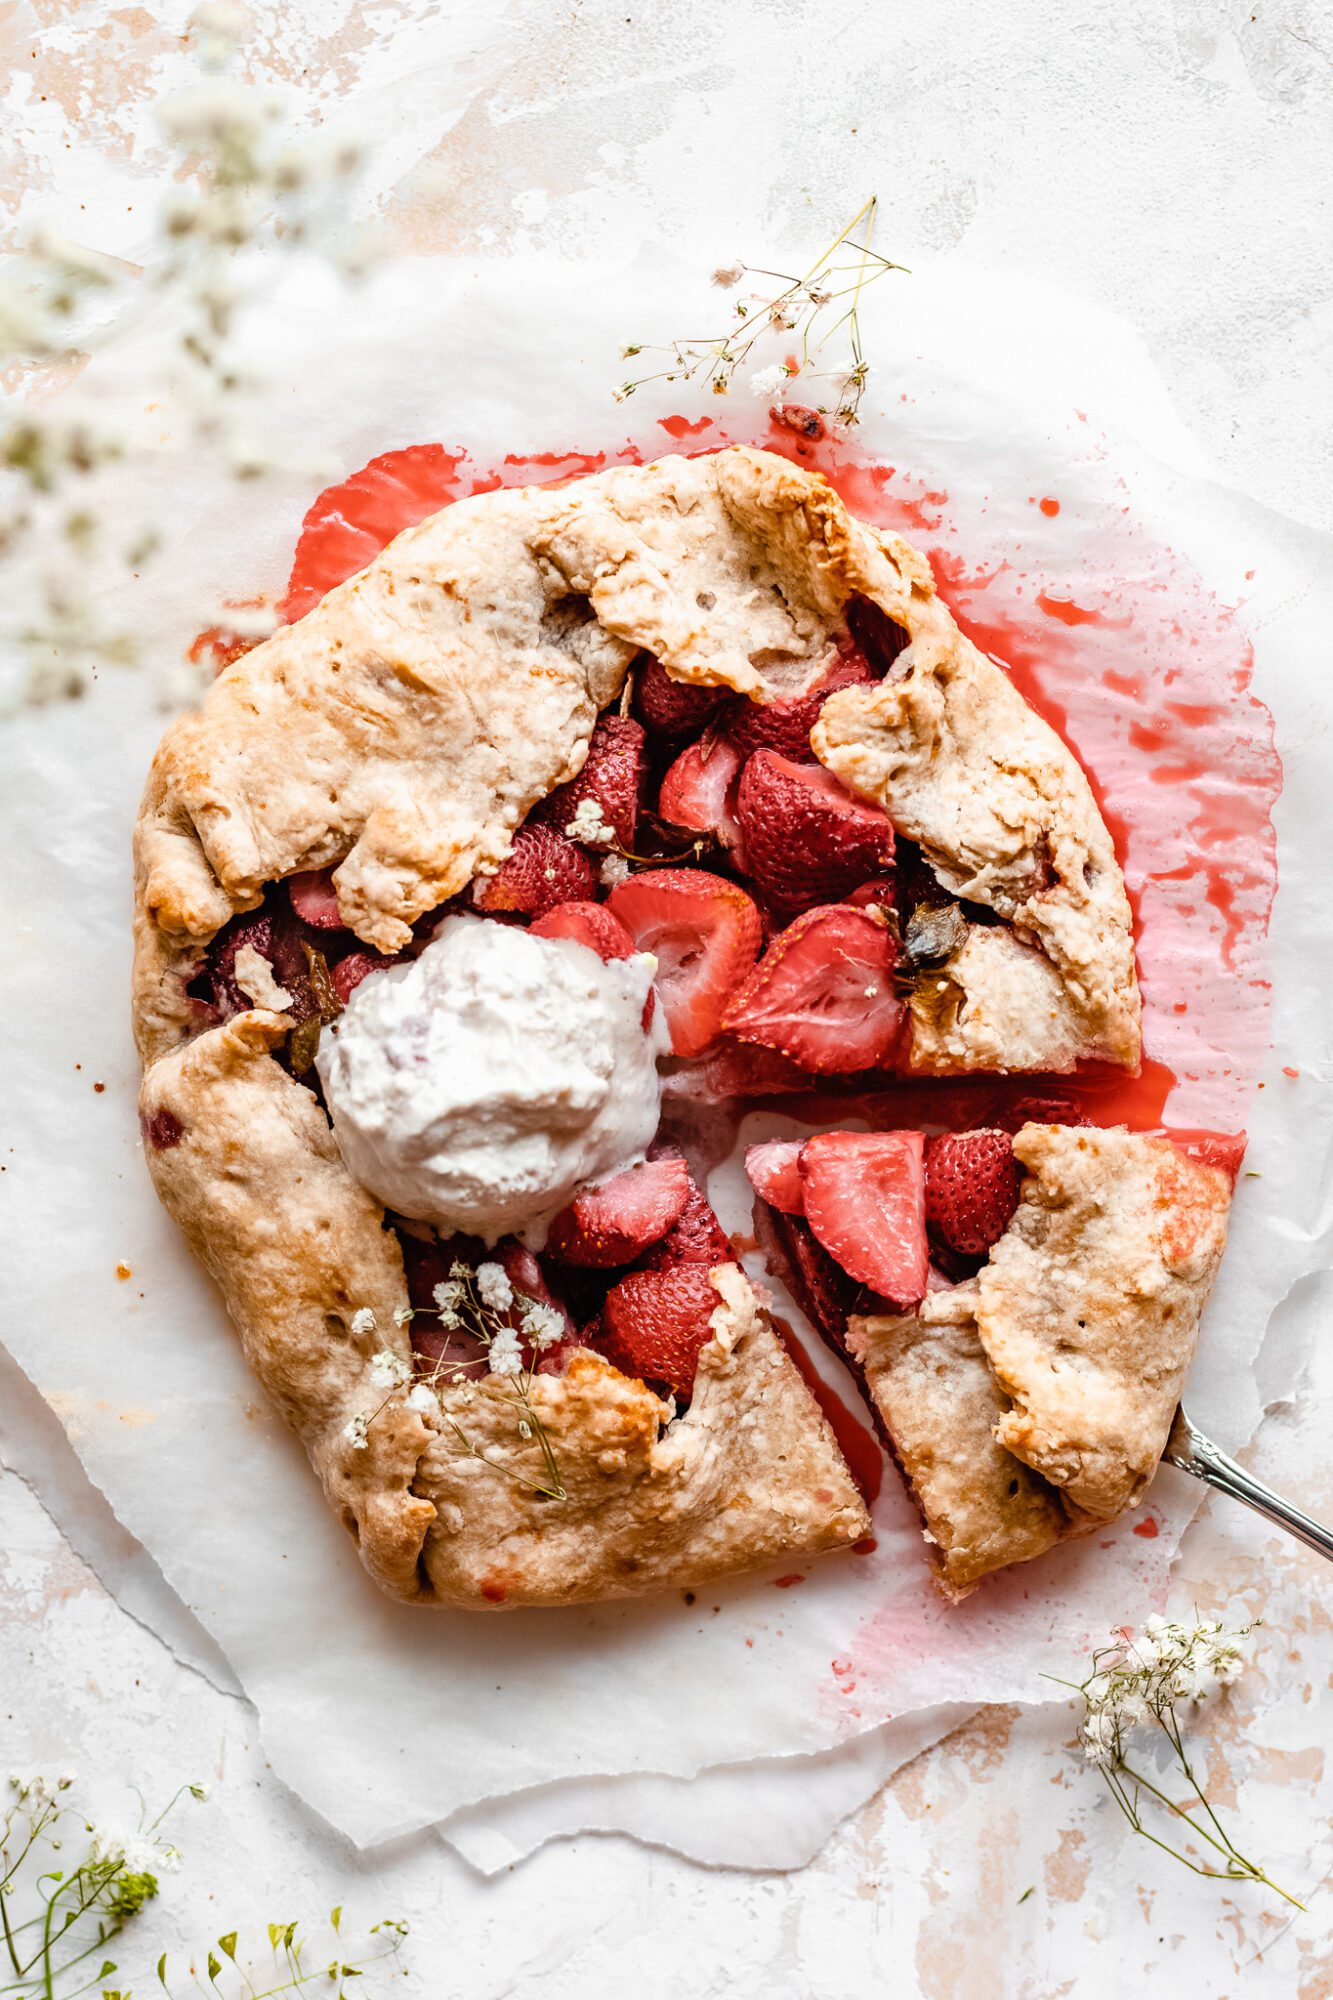 sliced strawberry galette with scoop of vanilla ice cream